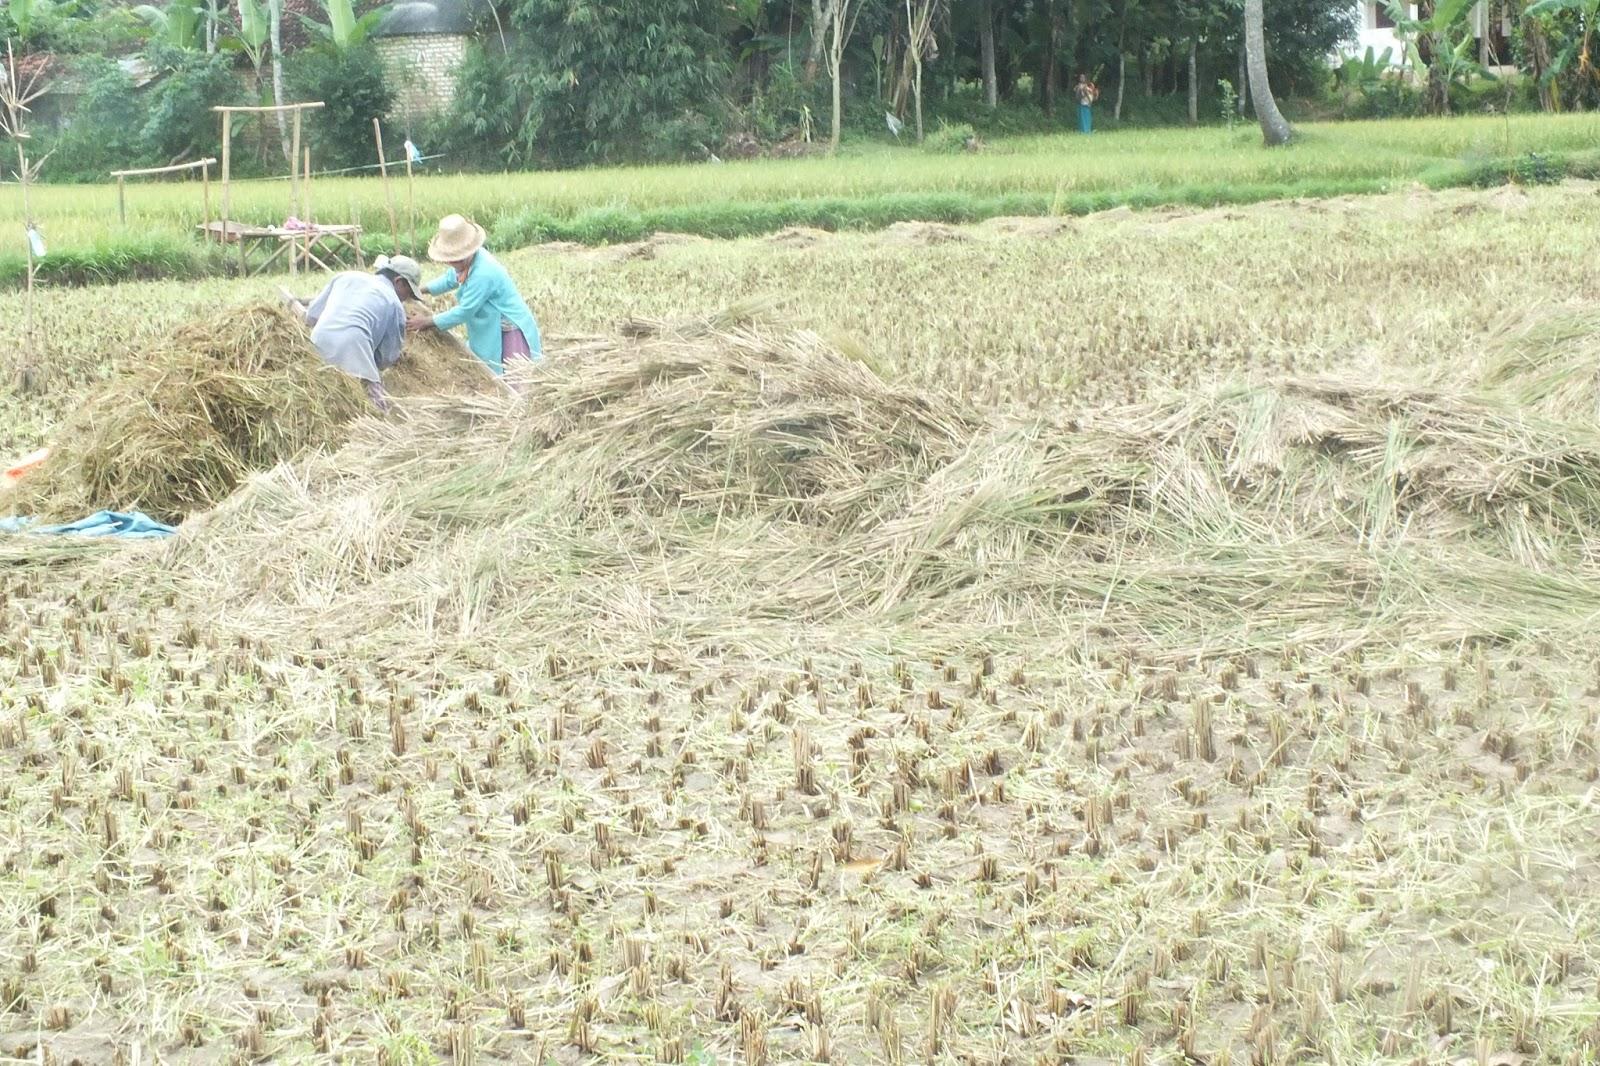 Potret Pekerjaan Keramahan Masyarakat Desa Kasengan Kabupaten Petani Memanen Padi